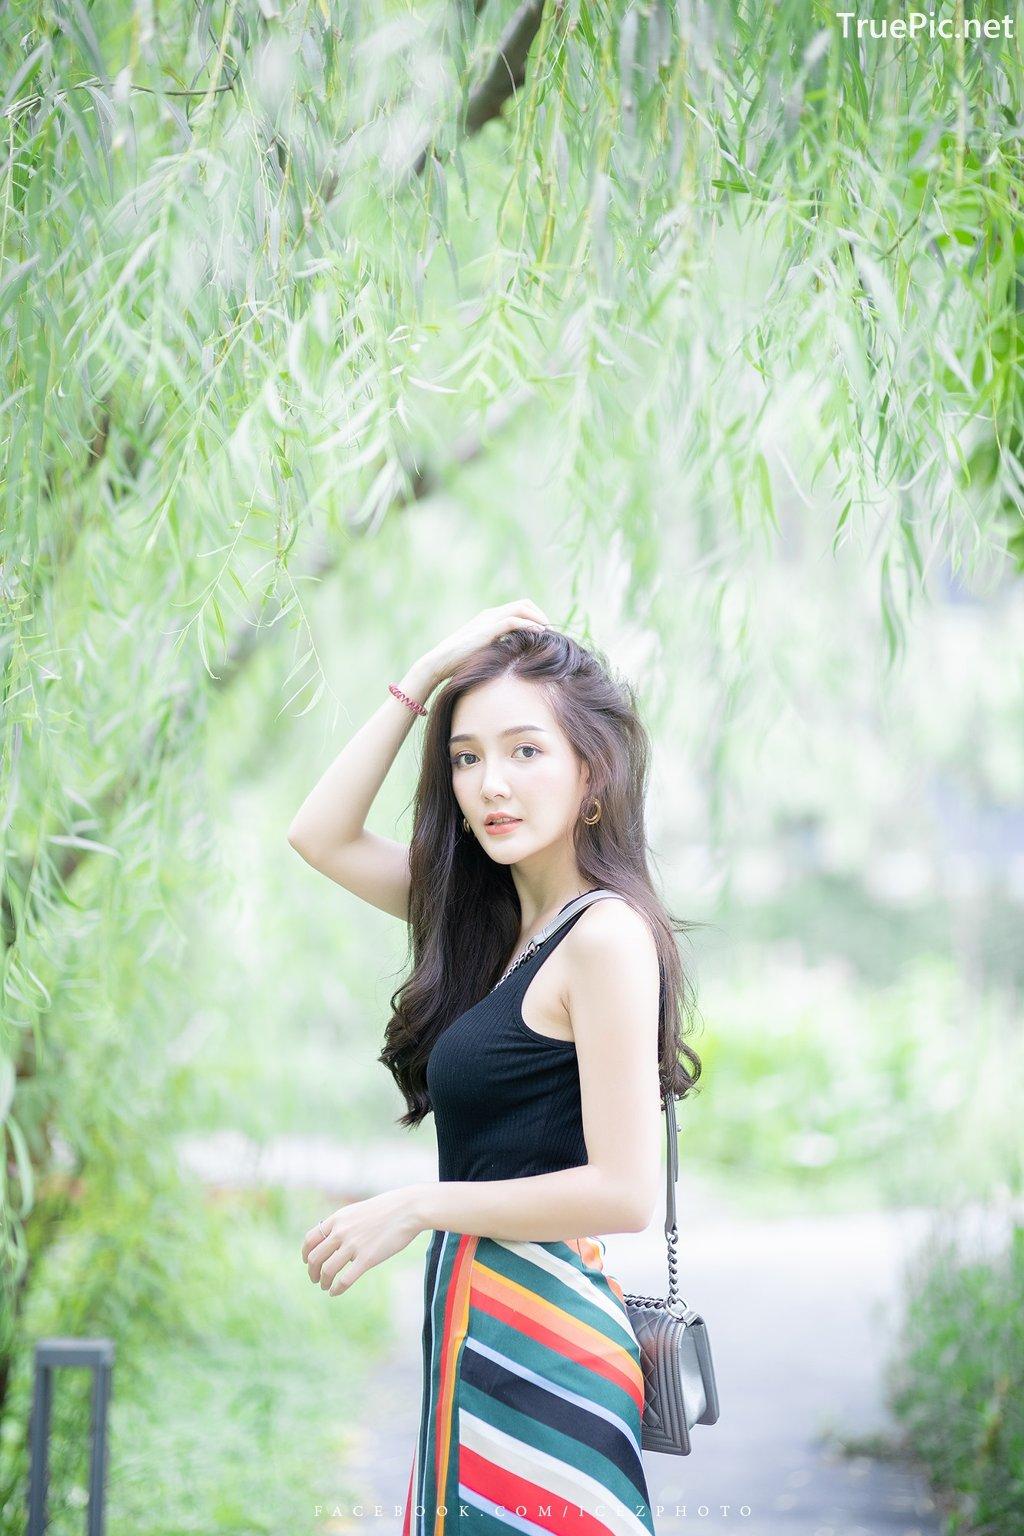 Image-Thailand-Model-Rossarin-Klinhom-Beautiful-Girl-Lost-In-The-Flower-Garden-TruePic.net- Picture-3